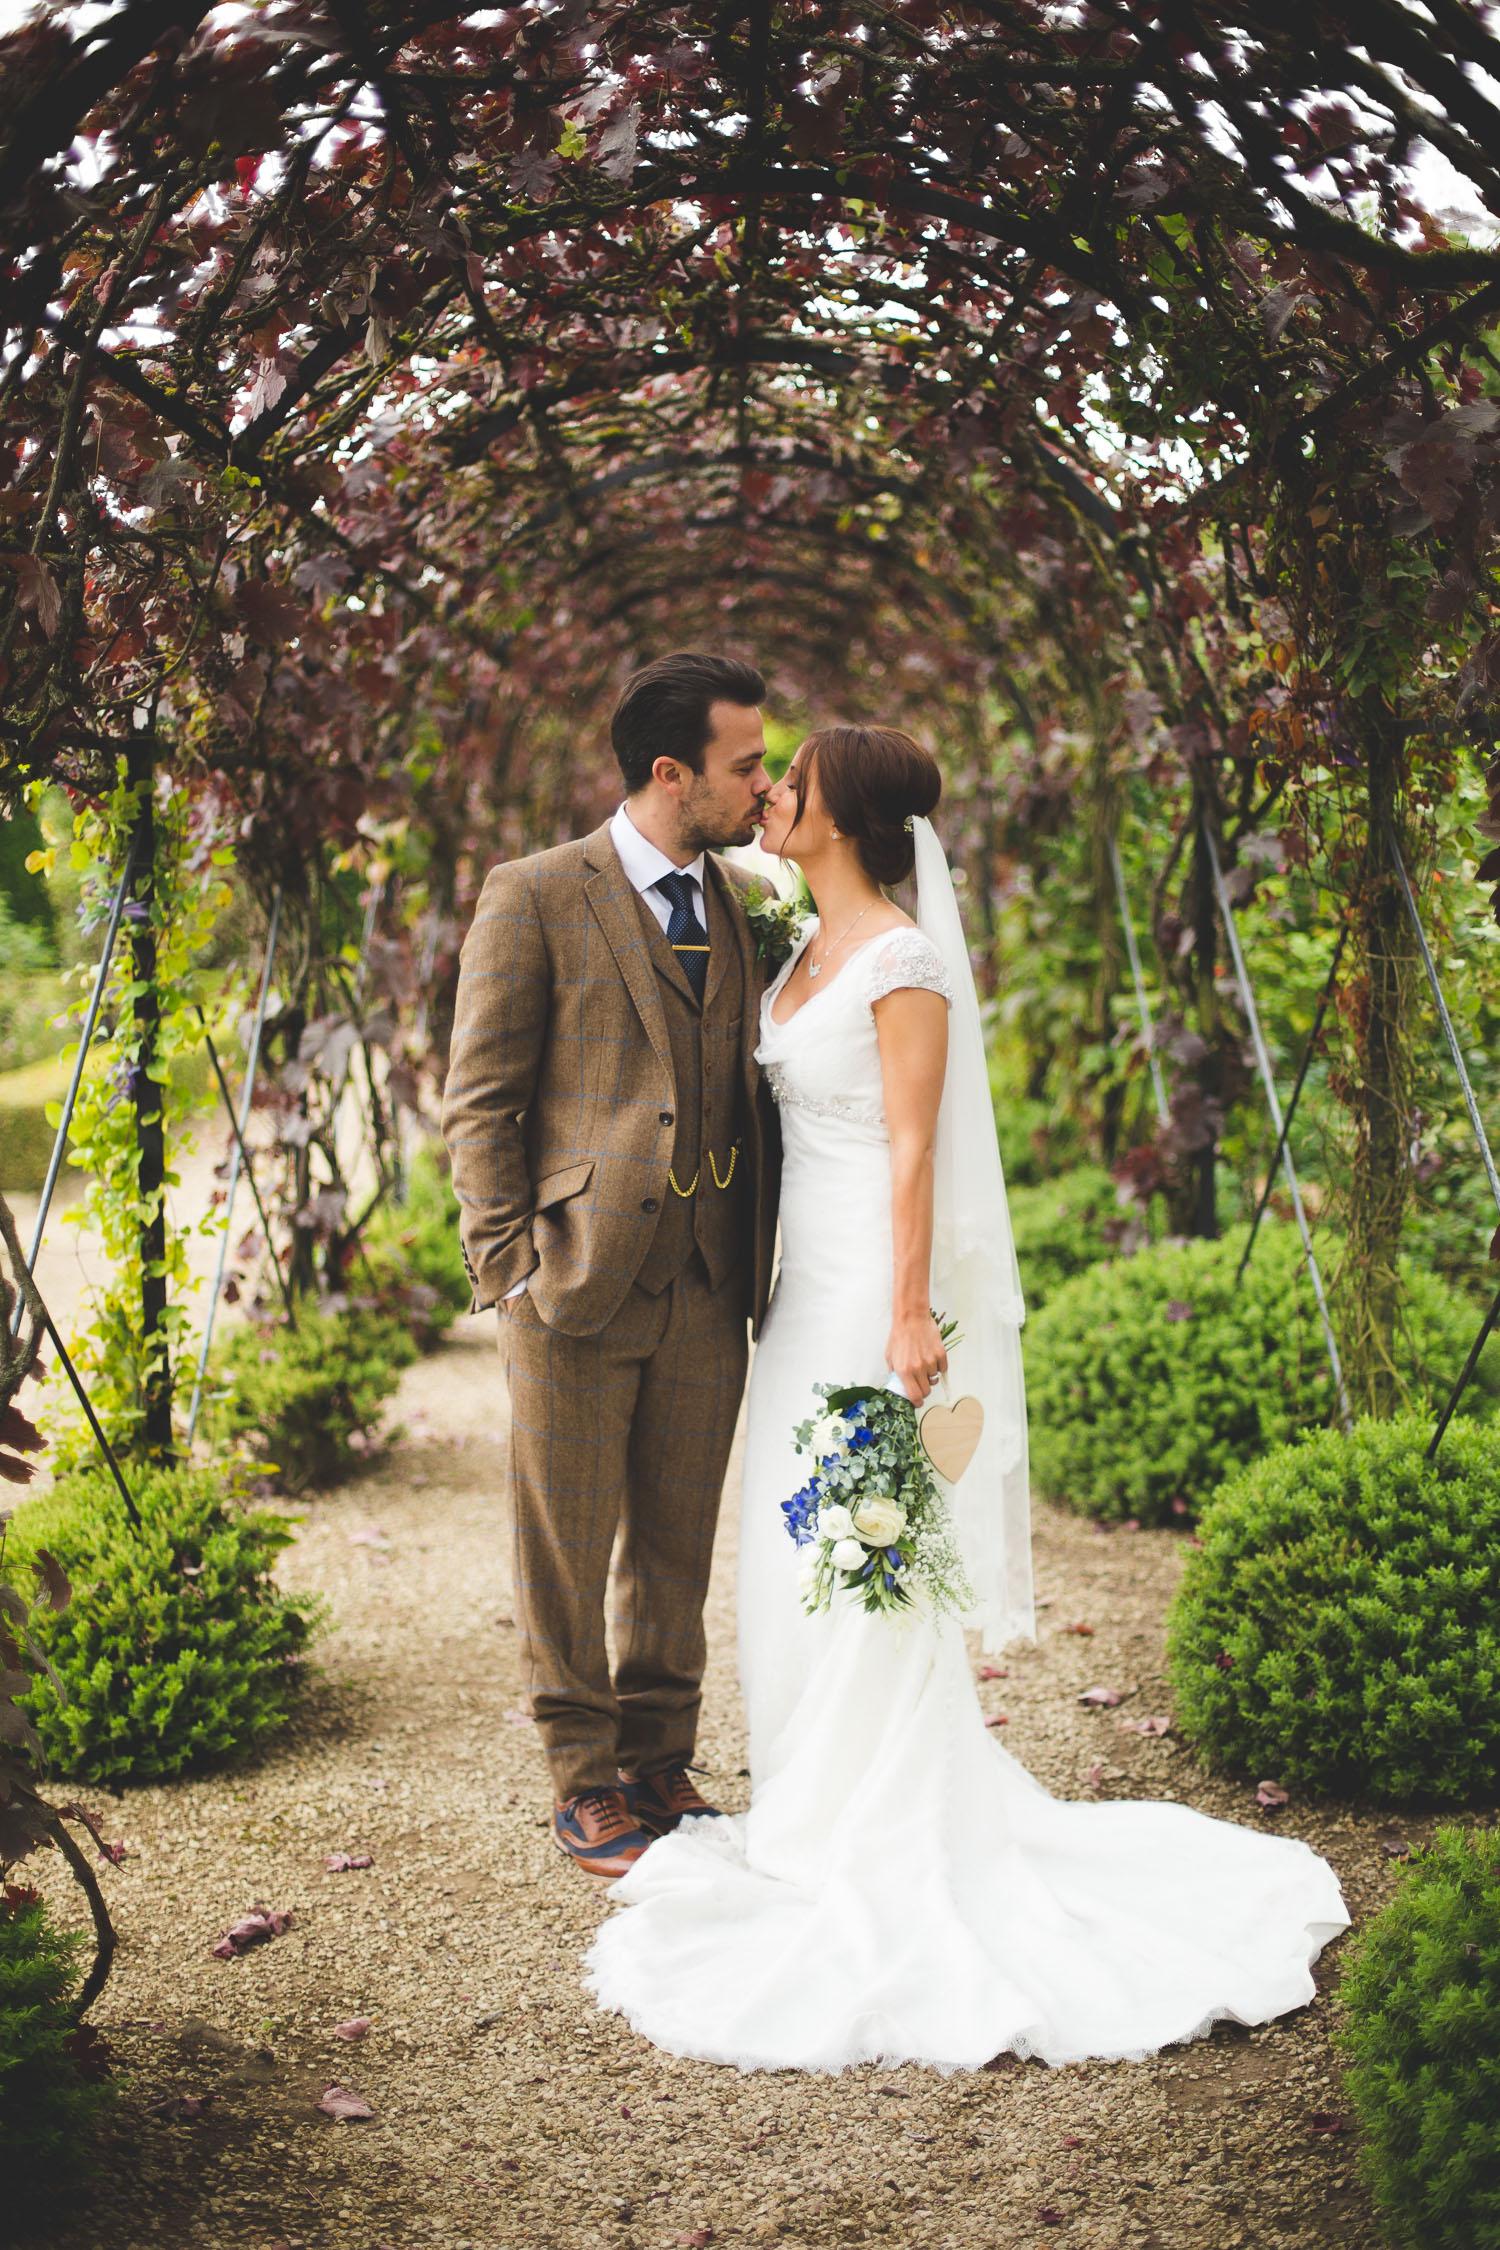 Surrey Wedding Photographer Jake Meg070.jpg